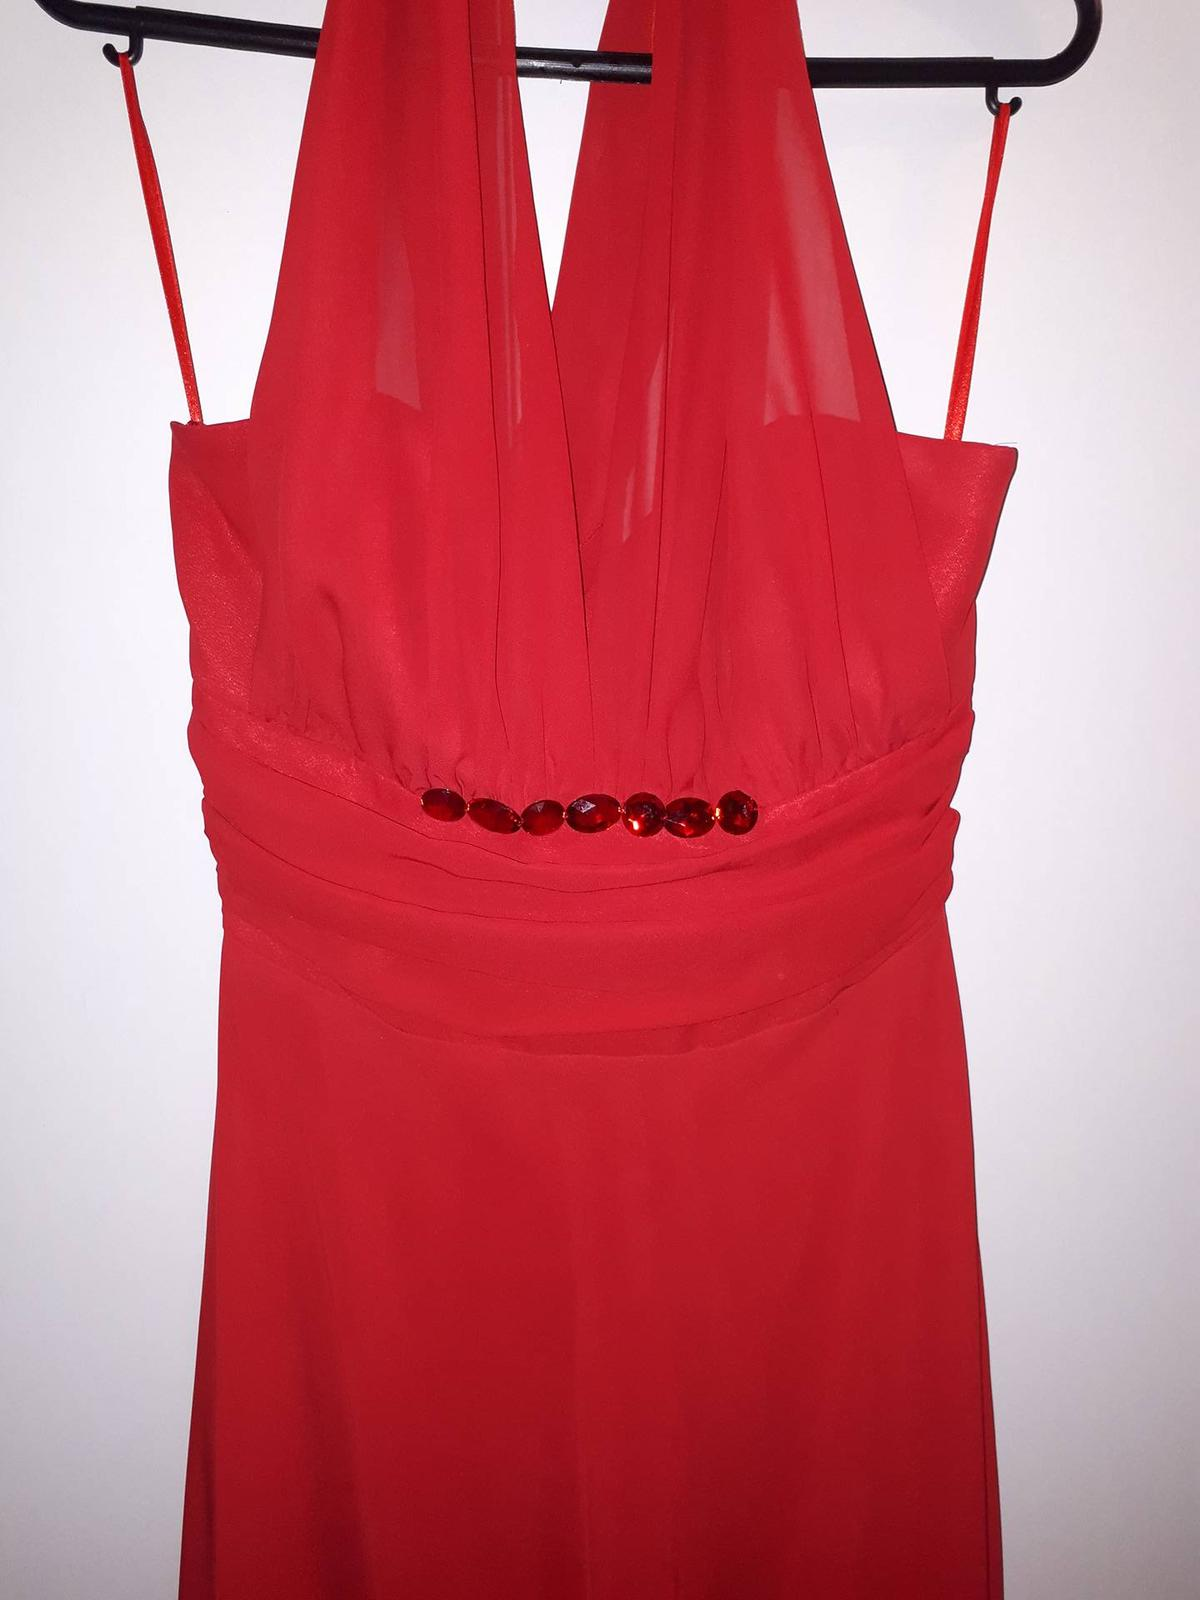 Červené spoločenské šaty - Obrázok č. 4